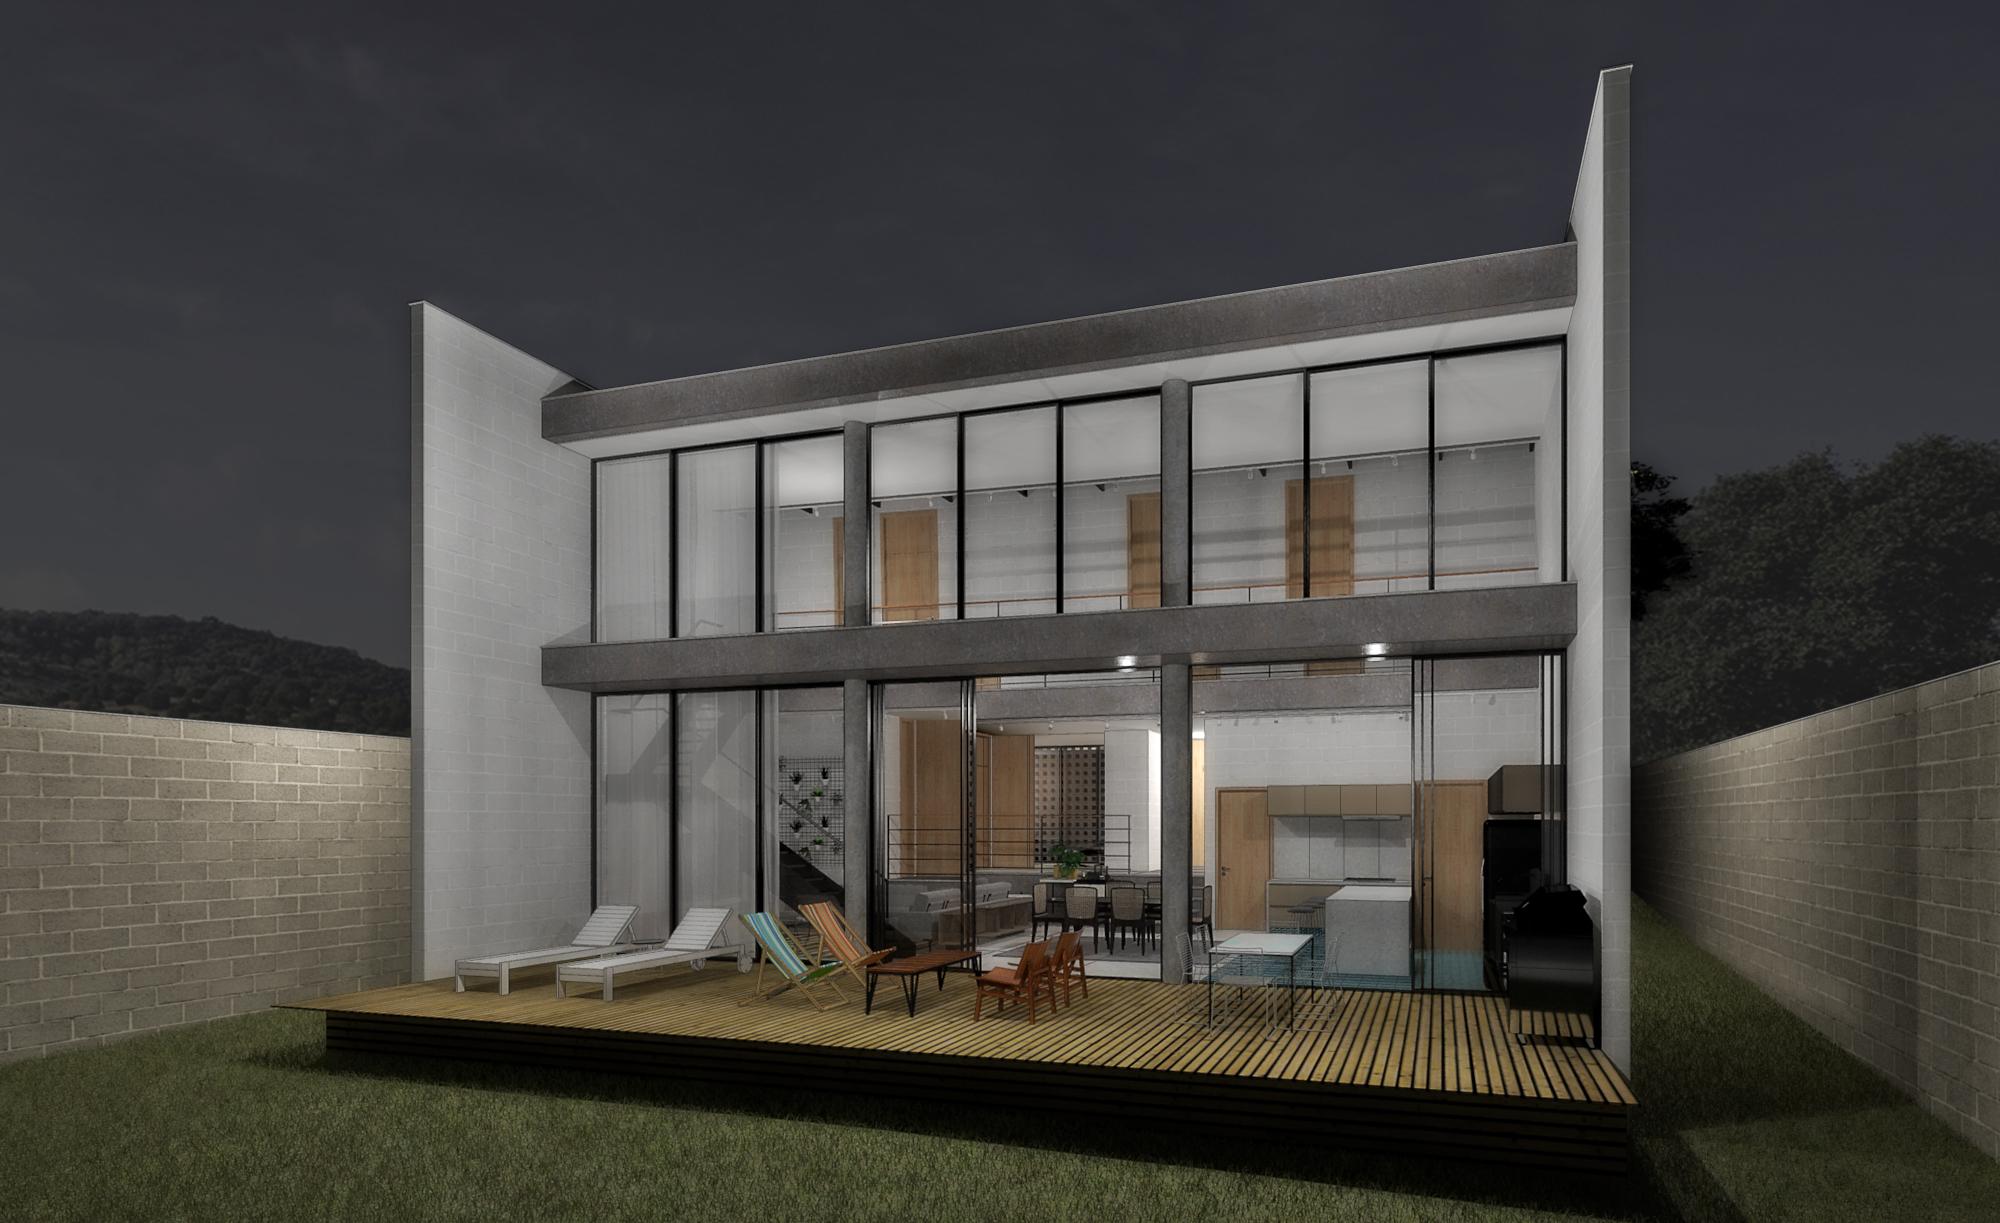 residencia-tn-daniel-carvalho-arquiteto-8